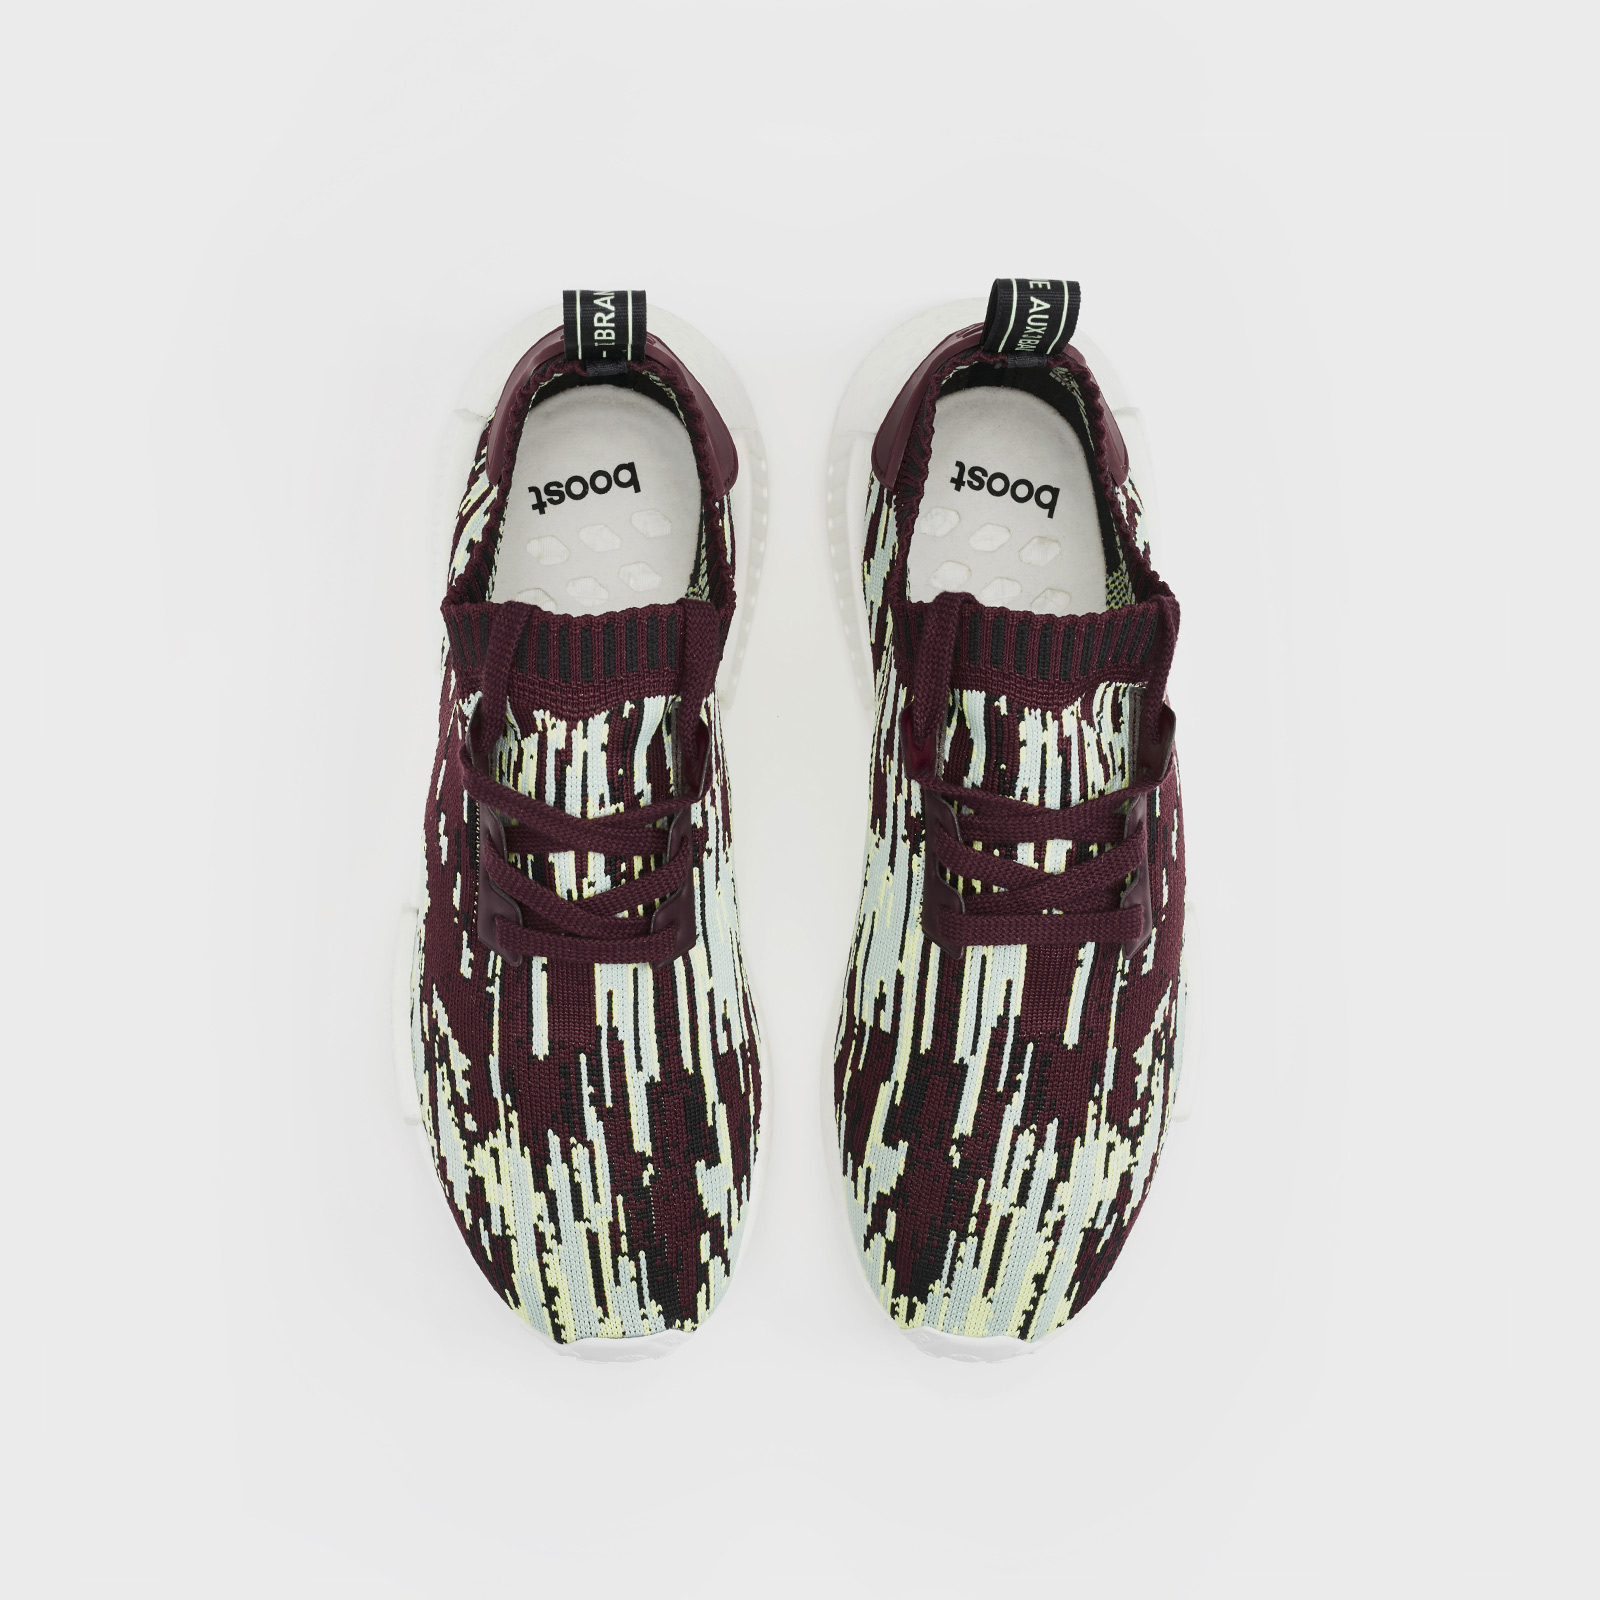 b6d78ded26d5b adidas NMD R1 PK Datamosh - Db2843 - Sneakersnstuff